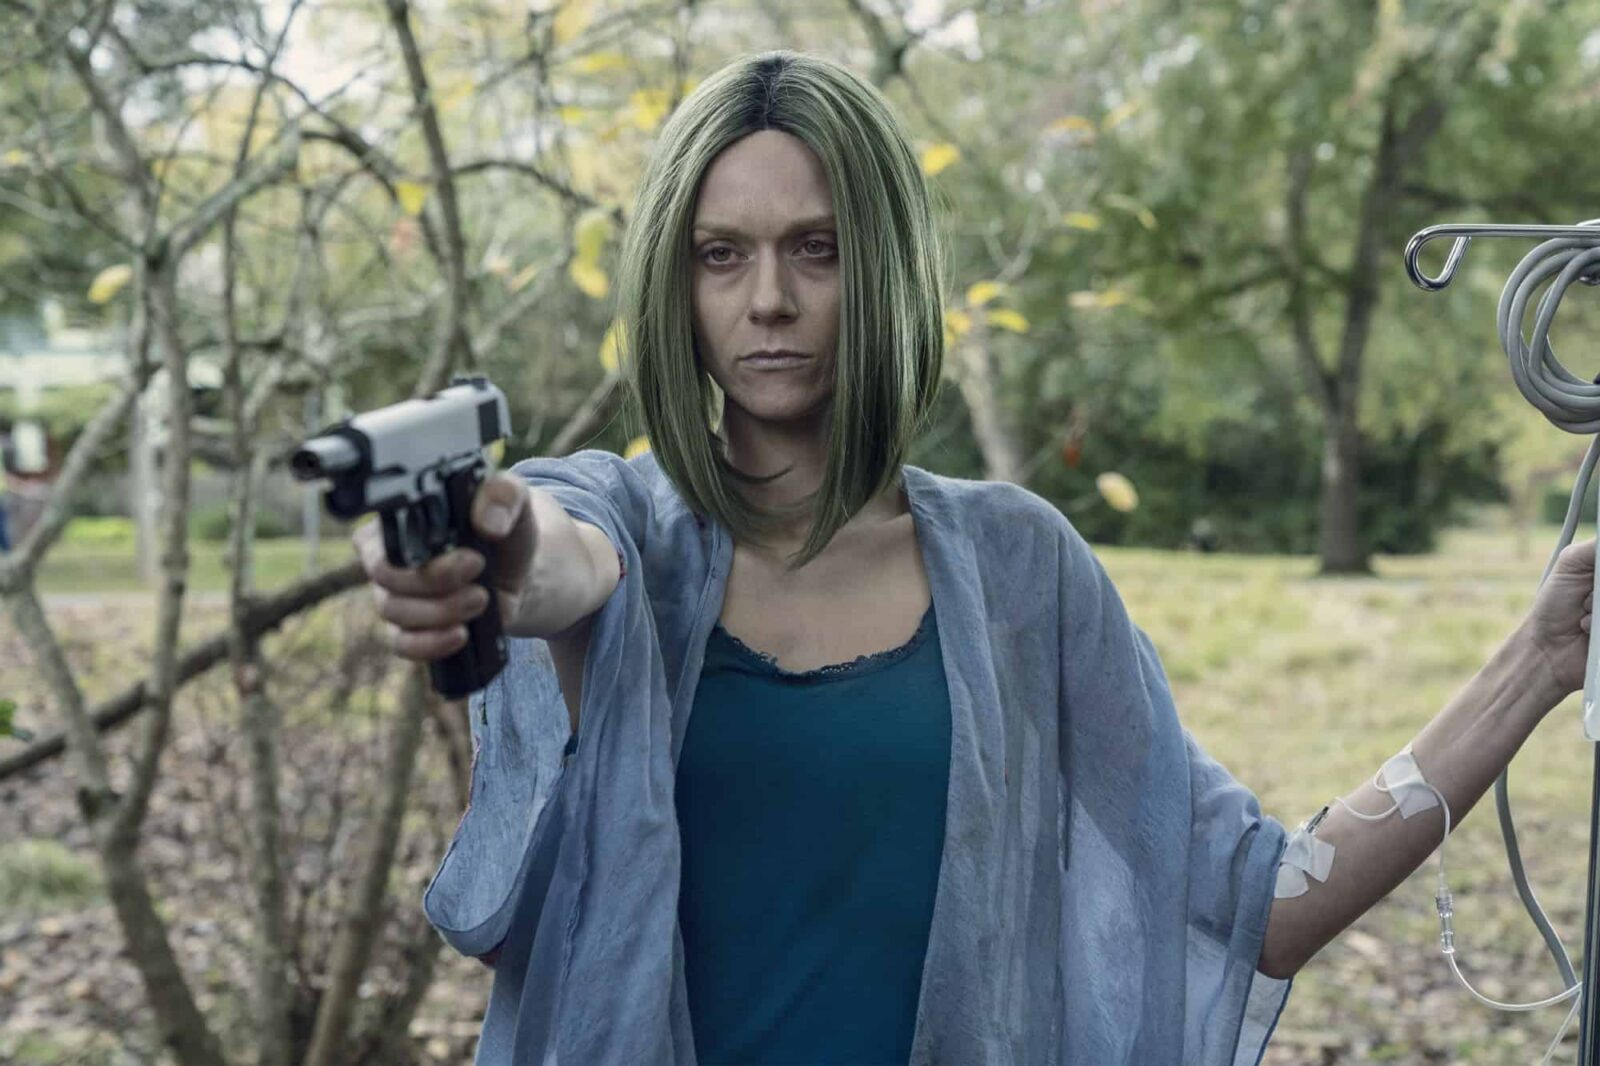 Hilarie Burton Morgan como Lucille en The Walking Dead 10x22 Here's Negan